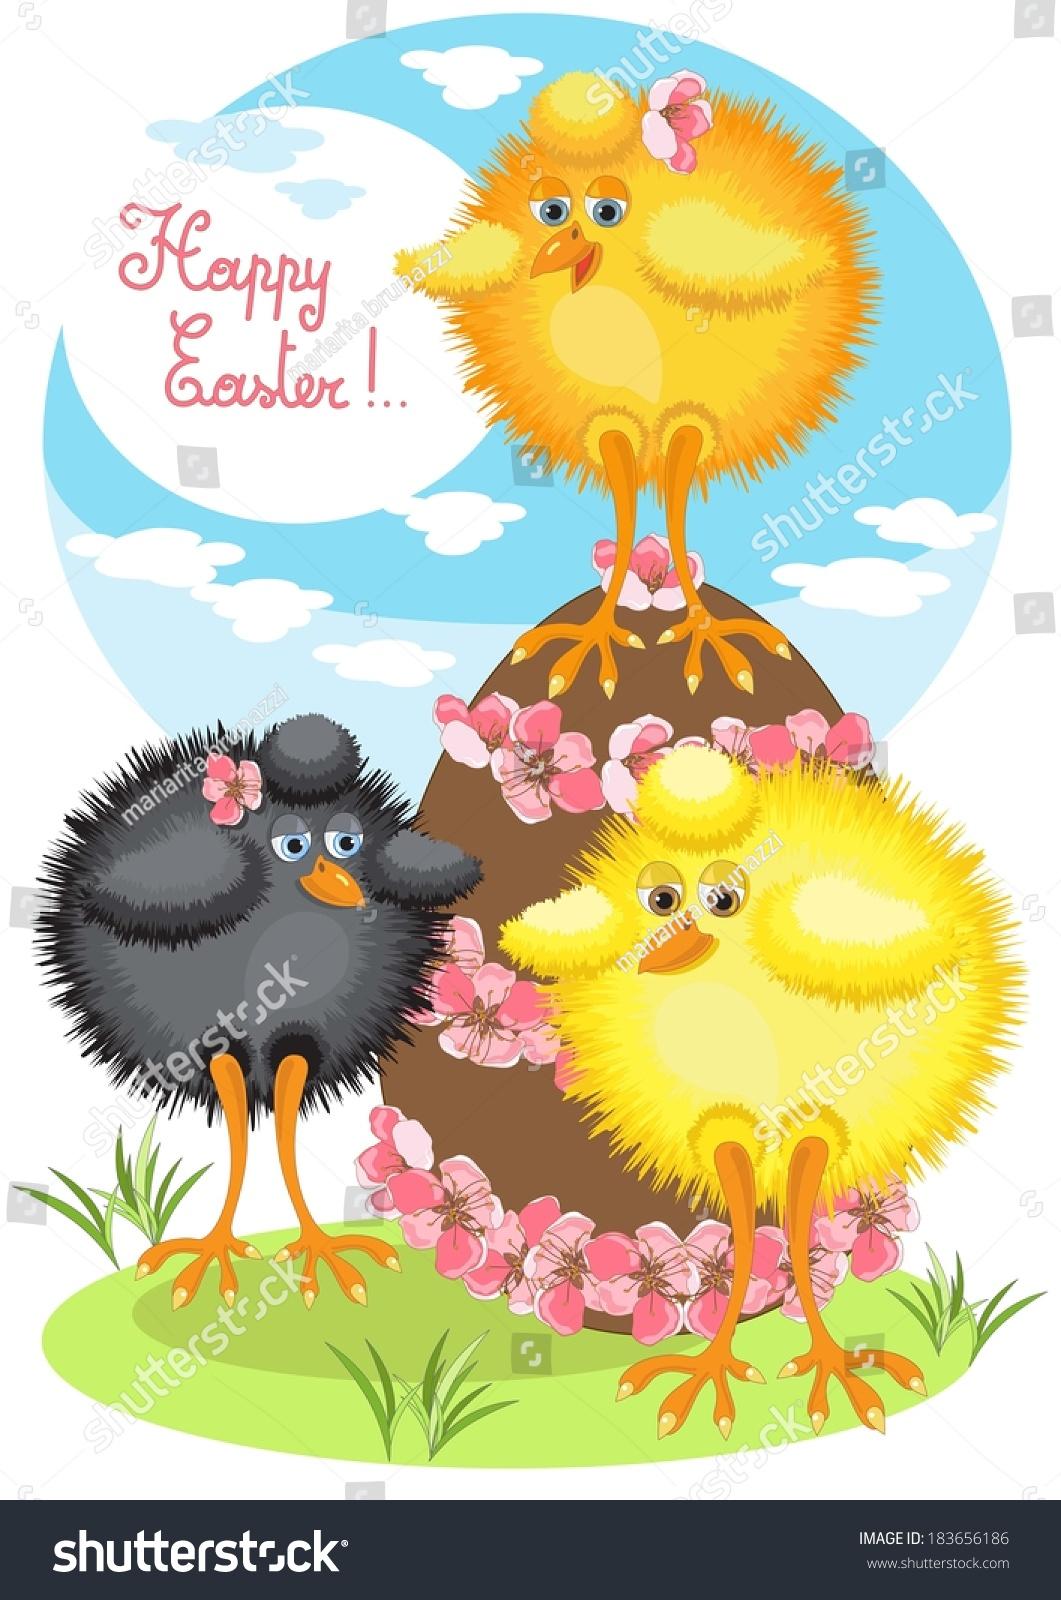 three big chicks easter egg stock vector 183656186 - shutterstock